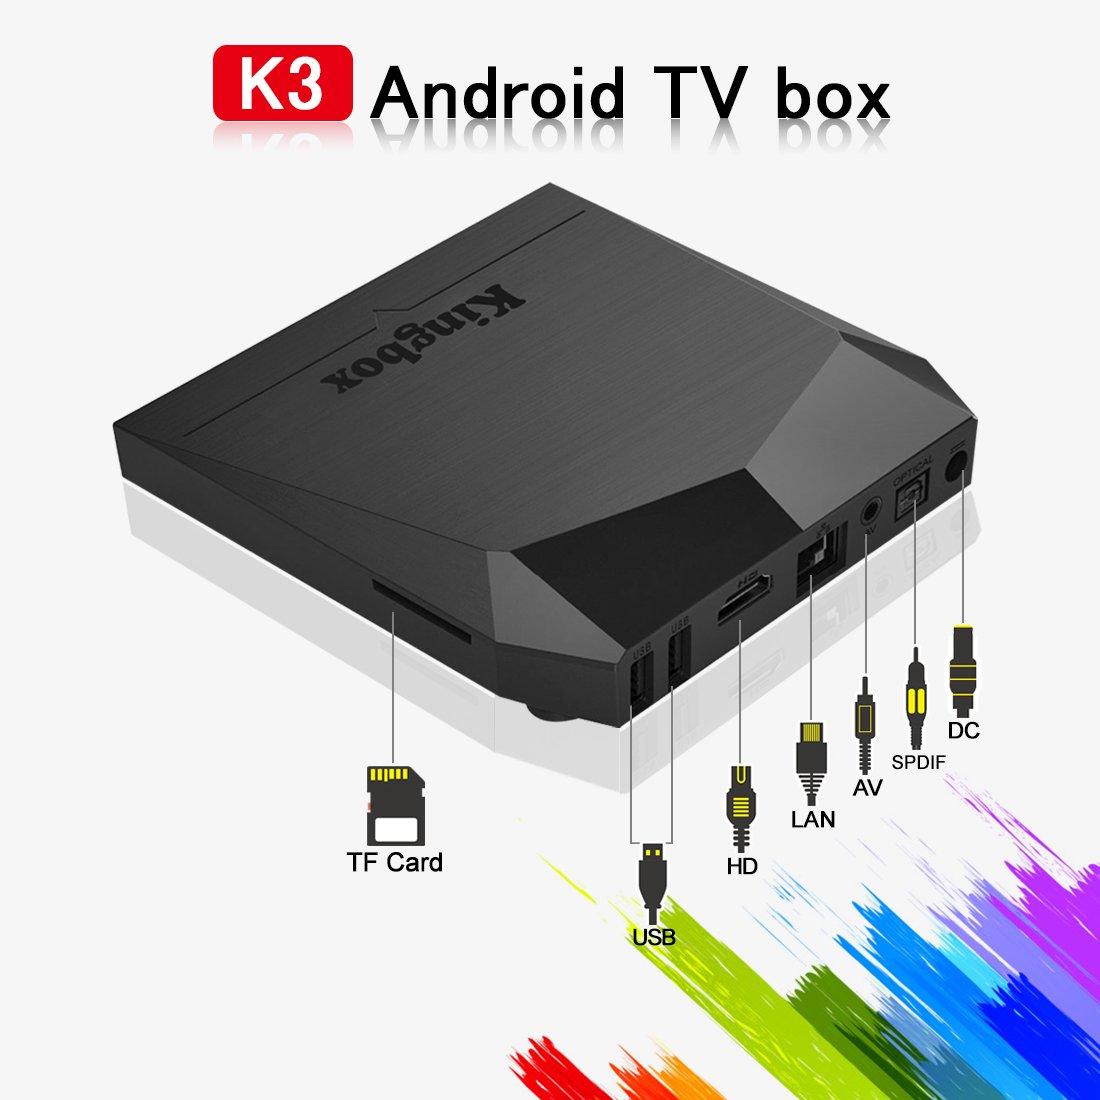 kingbox Android TV Box, K3 Android 6.0 caja con Amlogic S912 64 bits de ocho núcleos 2 gb/16gb apoyo Dual Wifi 2,4 + 5 GHz/4 K UHD/BT 4.0/1000 m LAN Android Smart